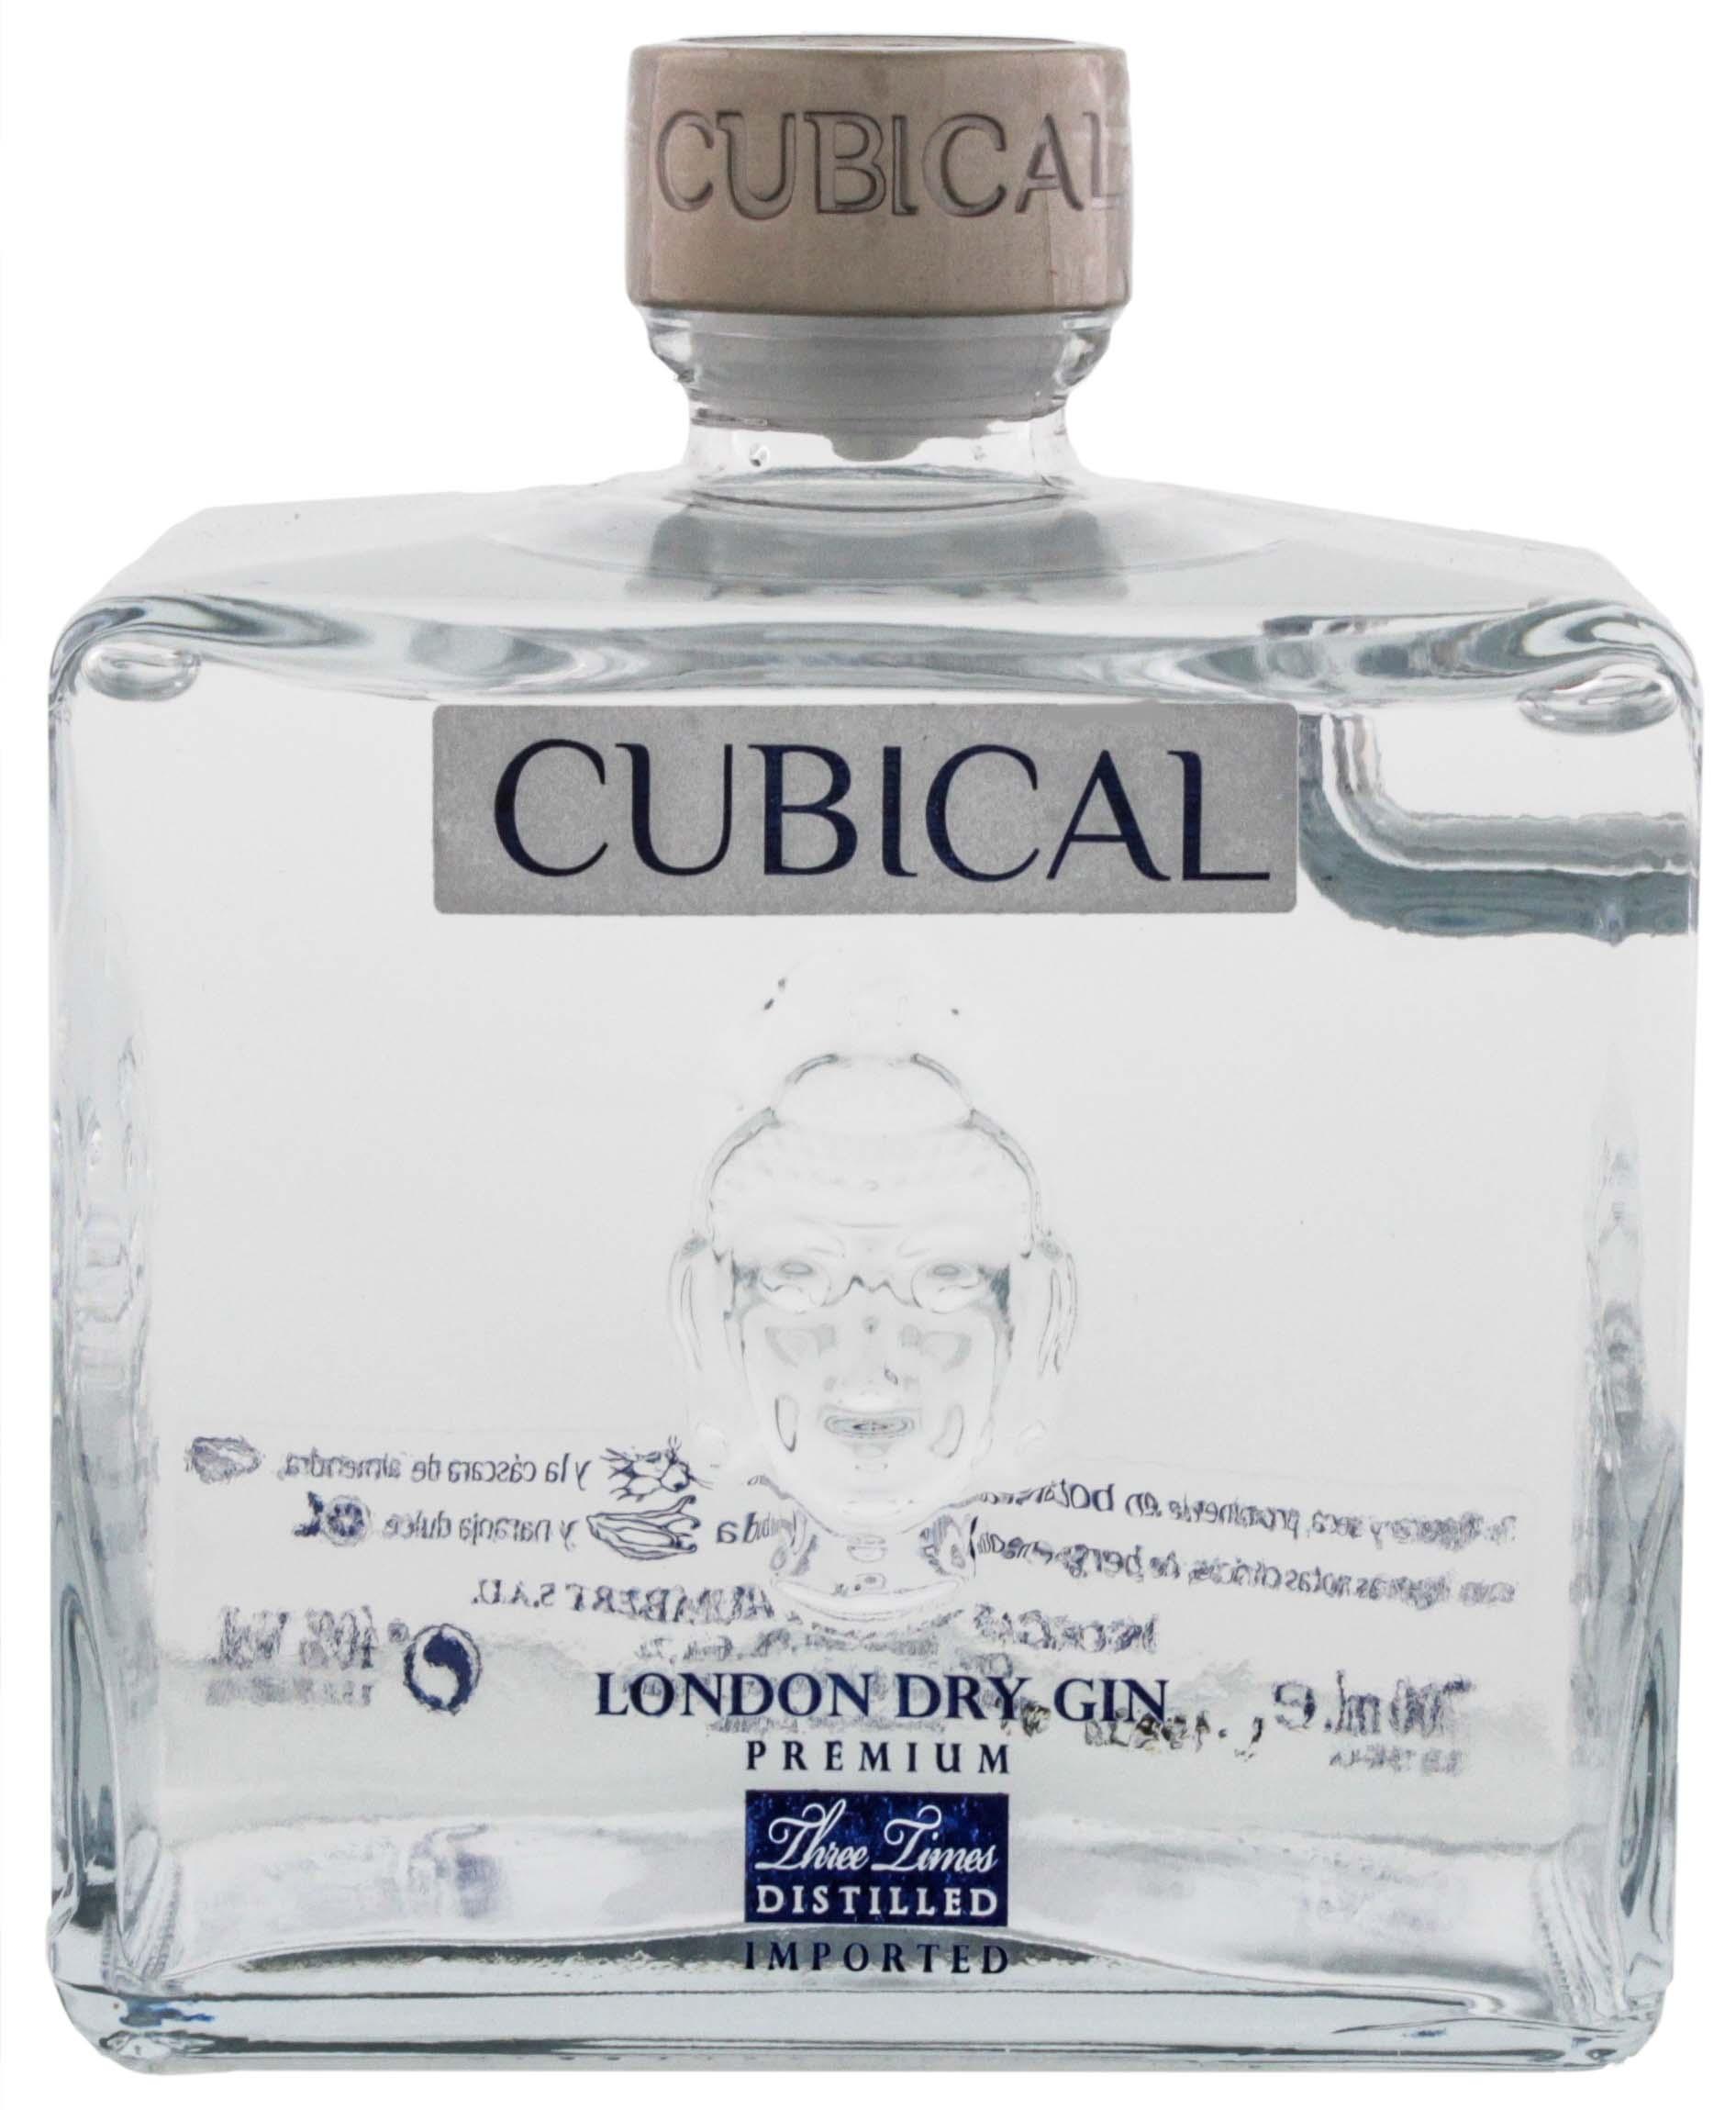 Cubical Premium London Dry Gin 0,7L